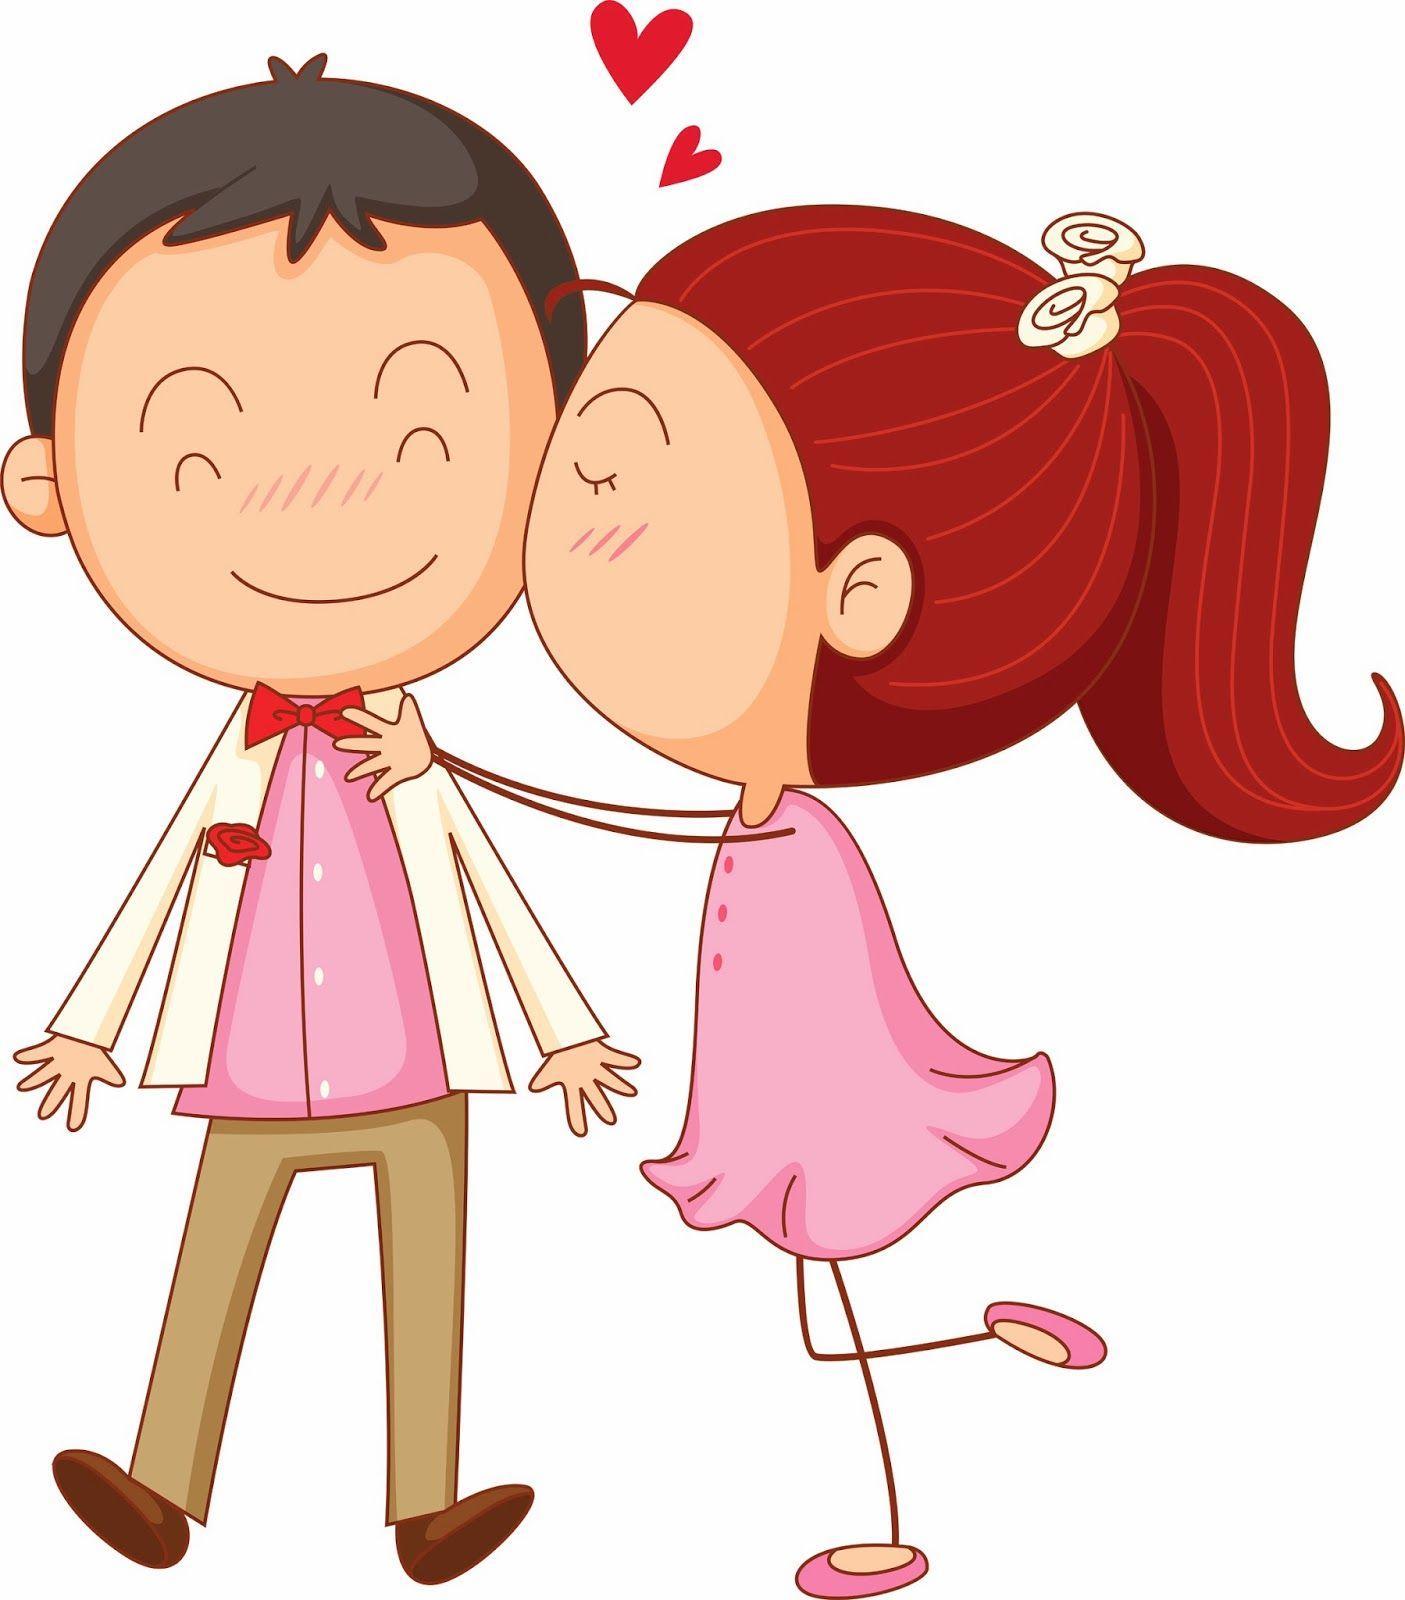 Joyful Expressions Good Monday Morning Valentines Day Cartoons Valentine Cartoon Love Cartoon Couple